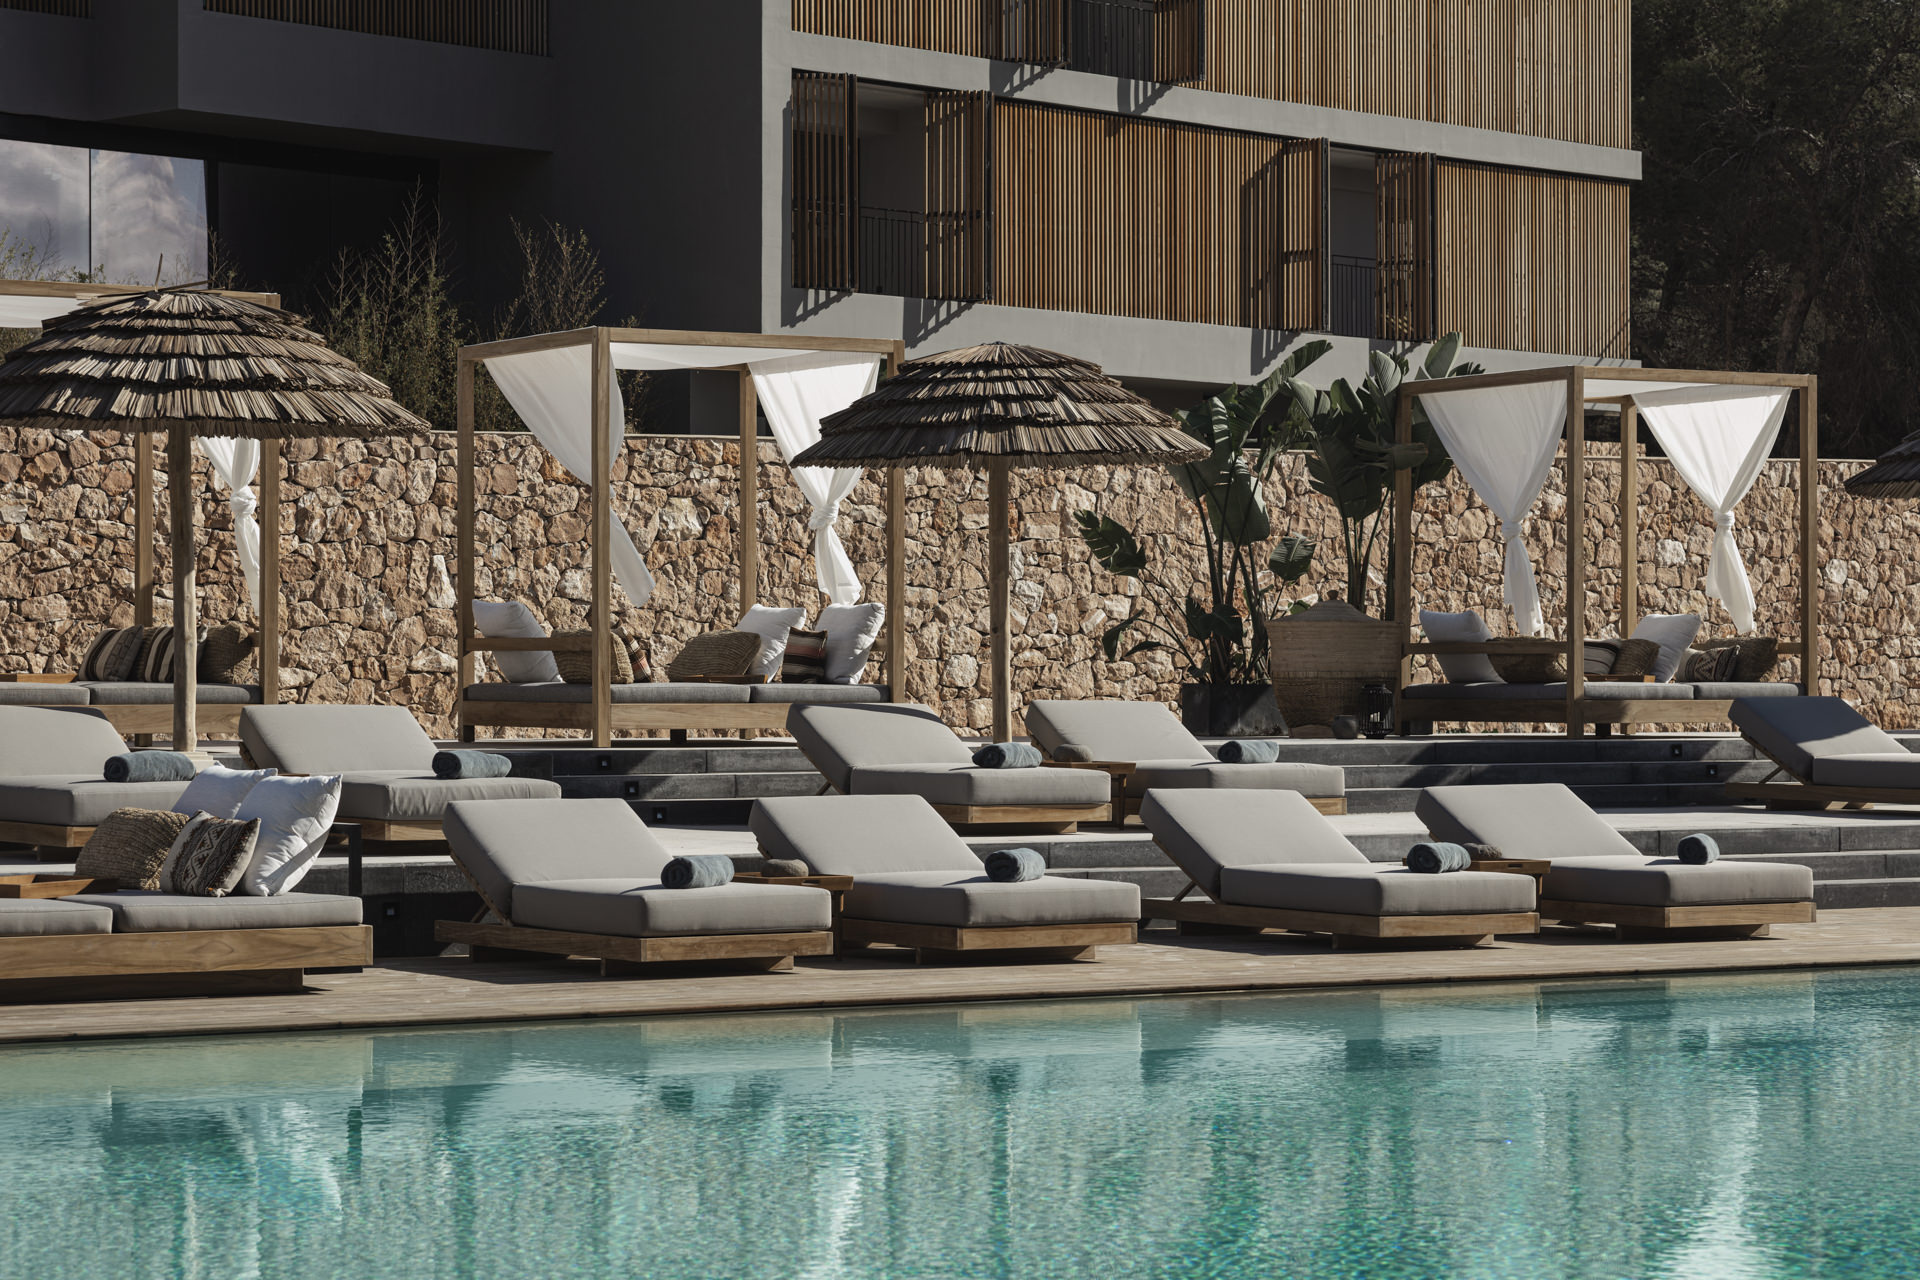 OKU-HOTELS_IBIZA_BY_GEORG-ROSKE_HOTEL-POOL_0698_LowRes